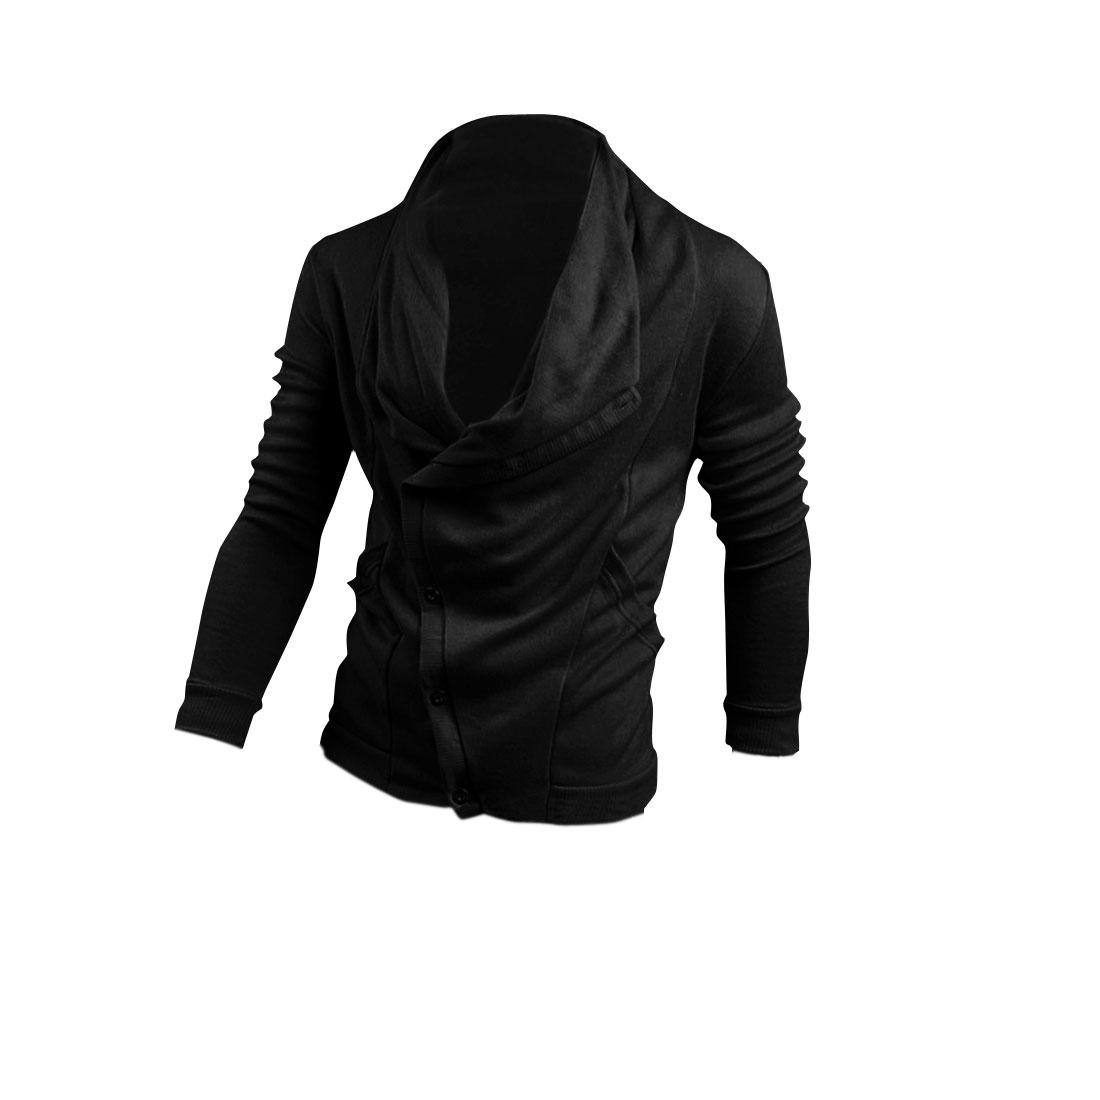 Men Cowl Neck Slant Button Up Pockets Below Hoodie Black M